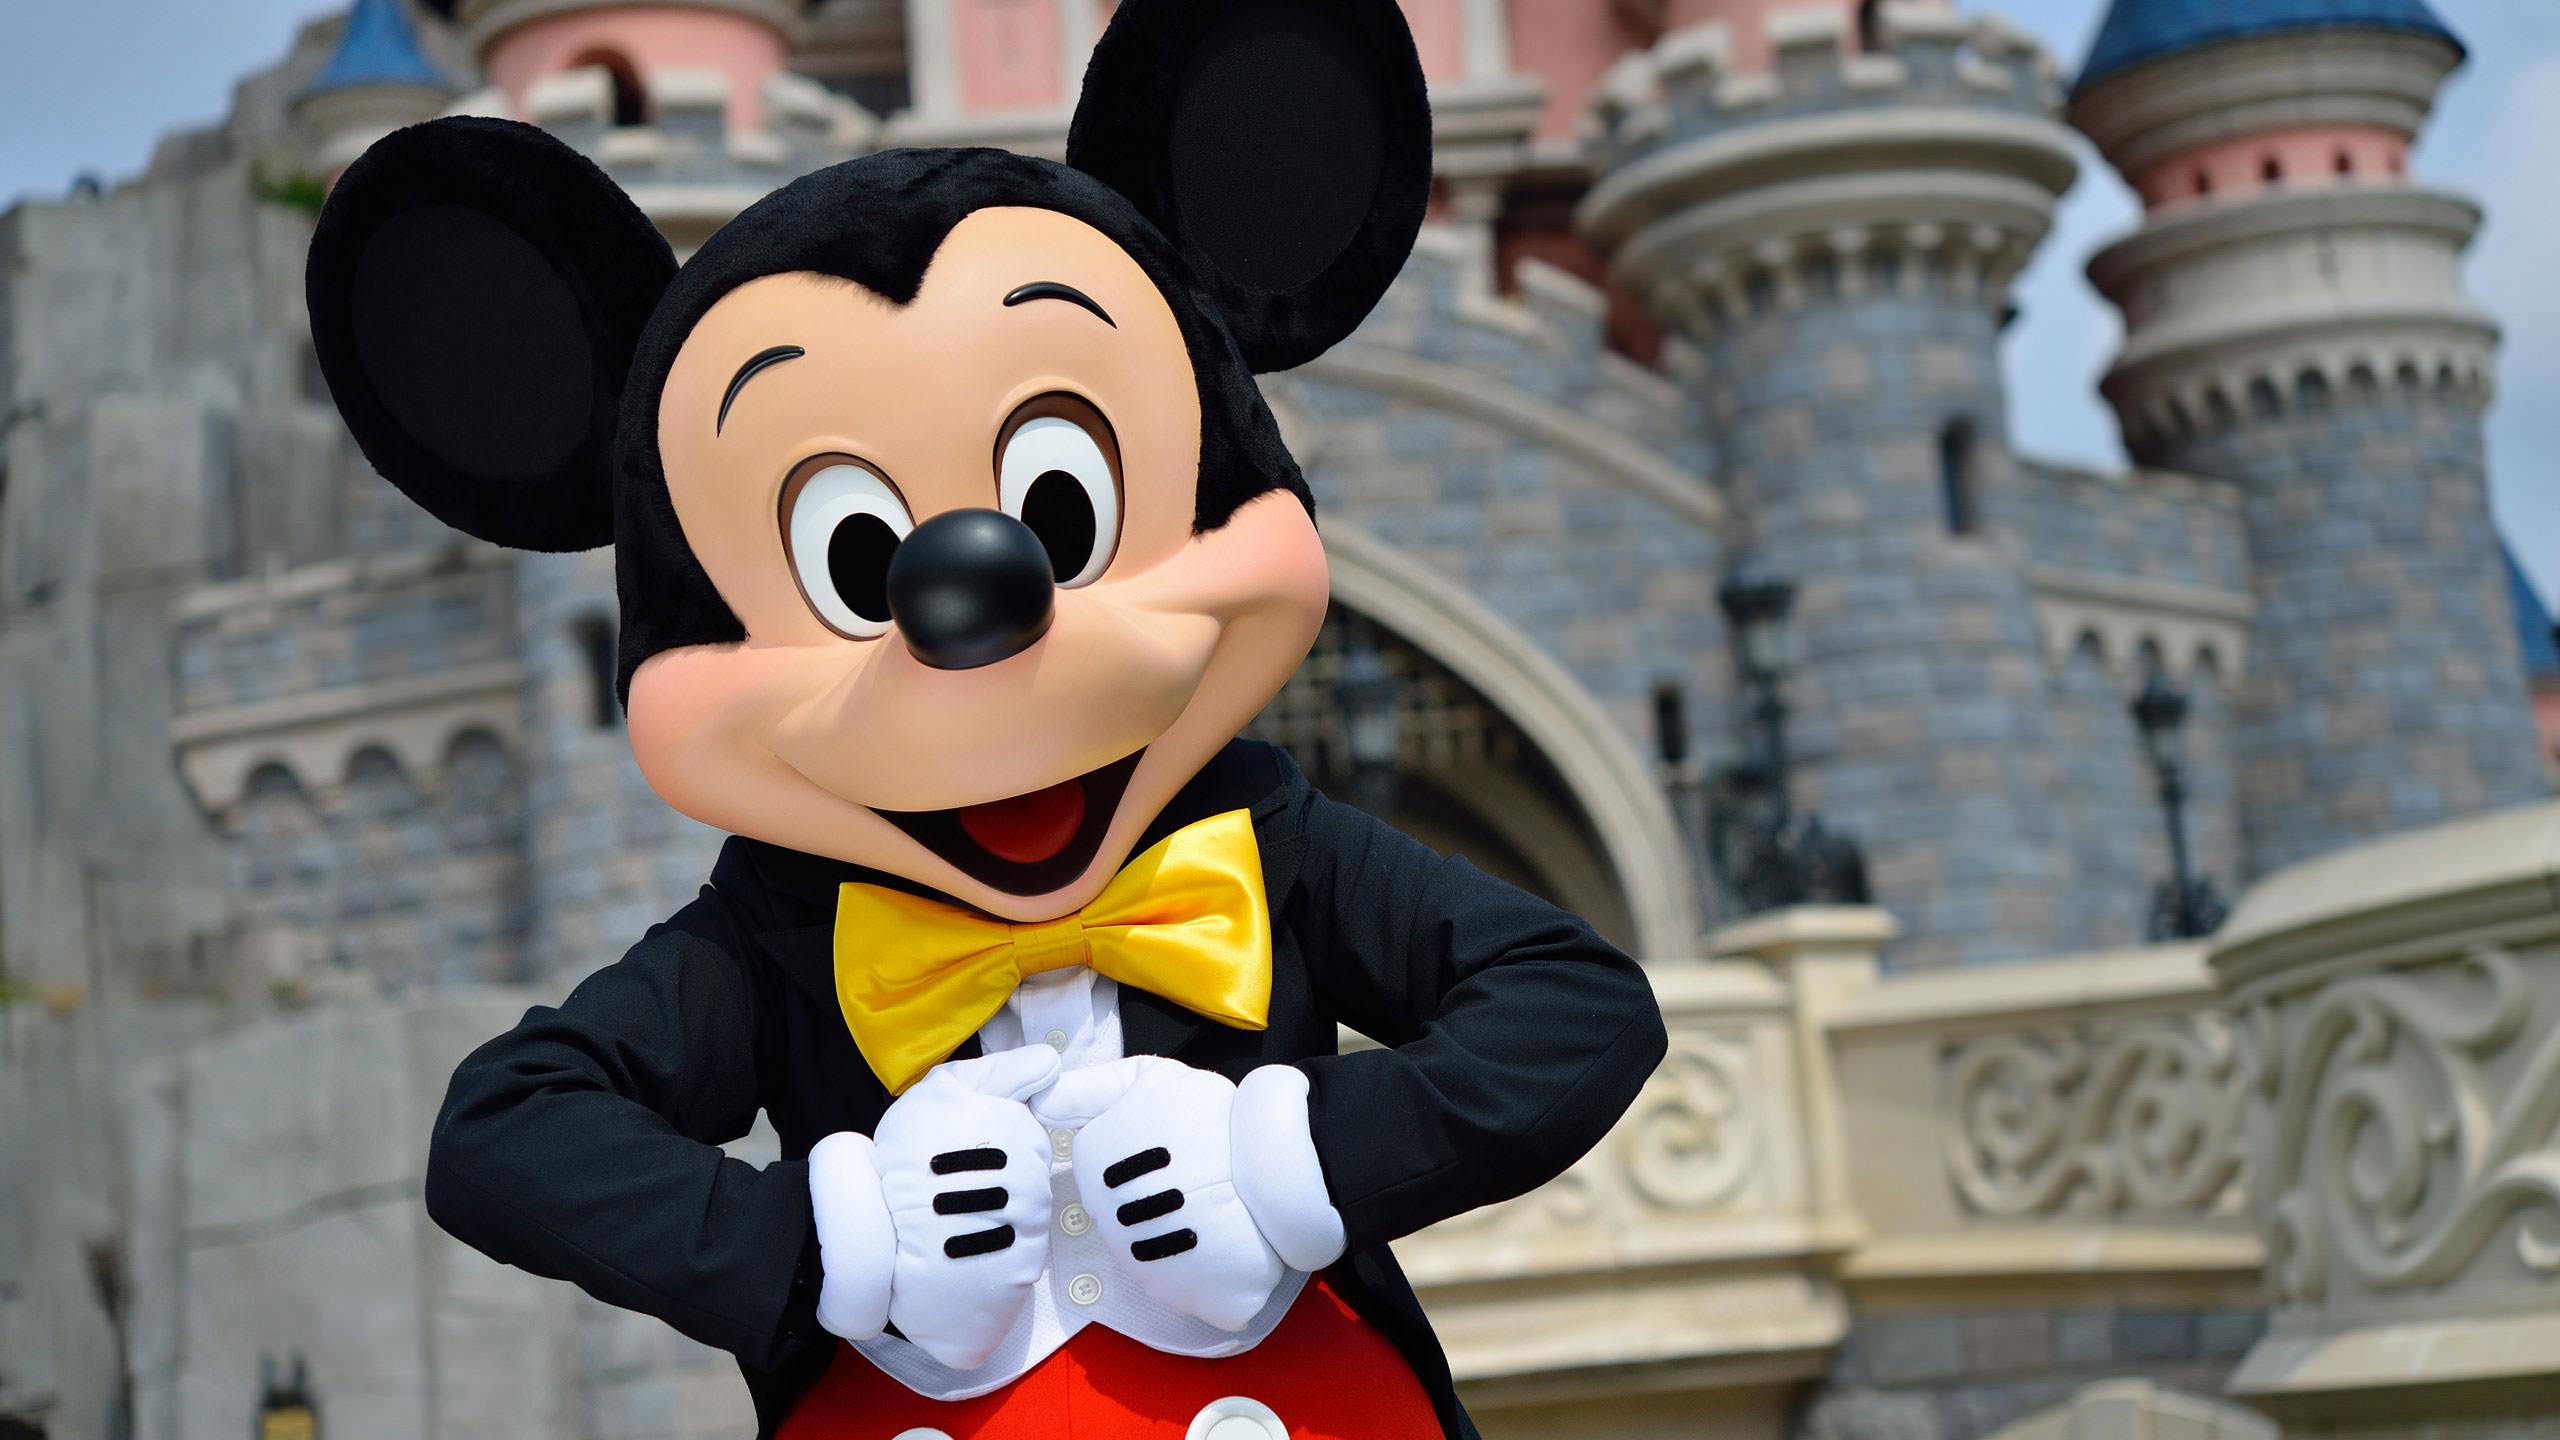 Calendrier Frequentation Disney.Calendrier D Affluence De Disneyland Paris Hello Disneyland